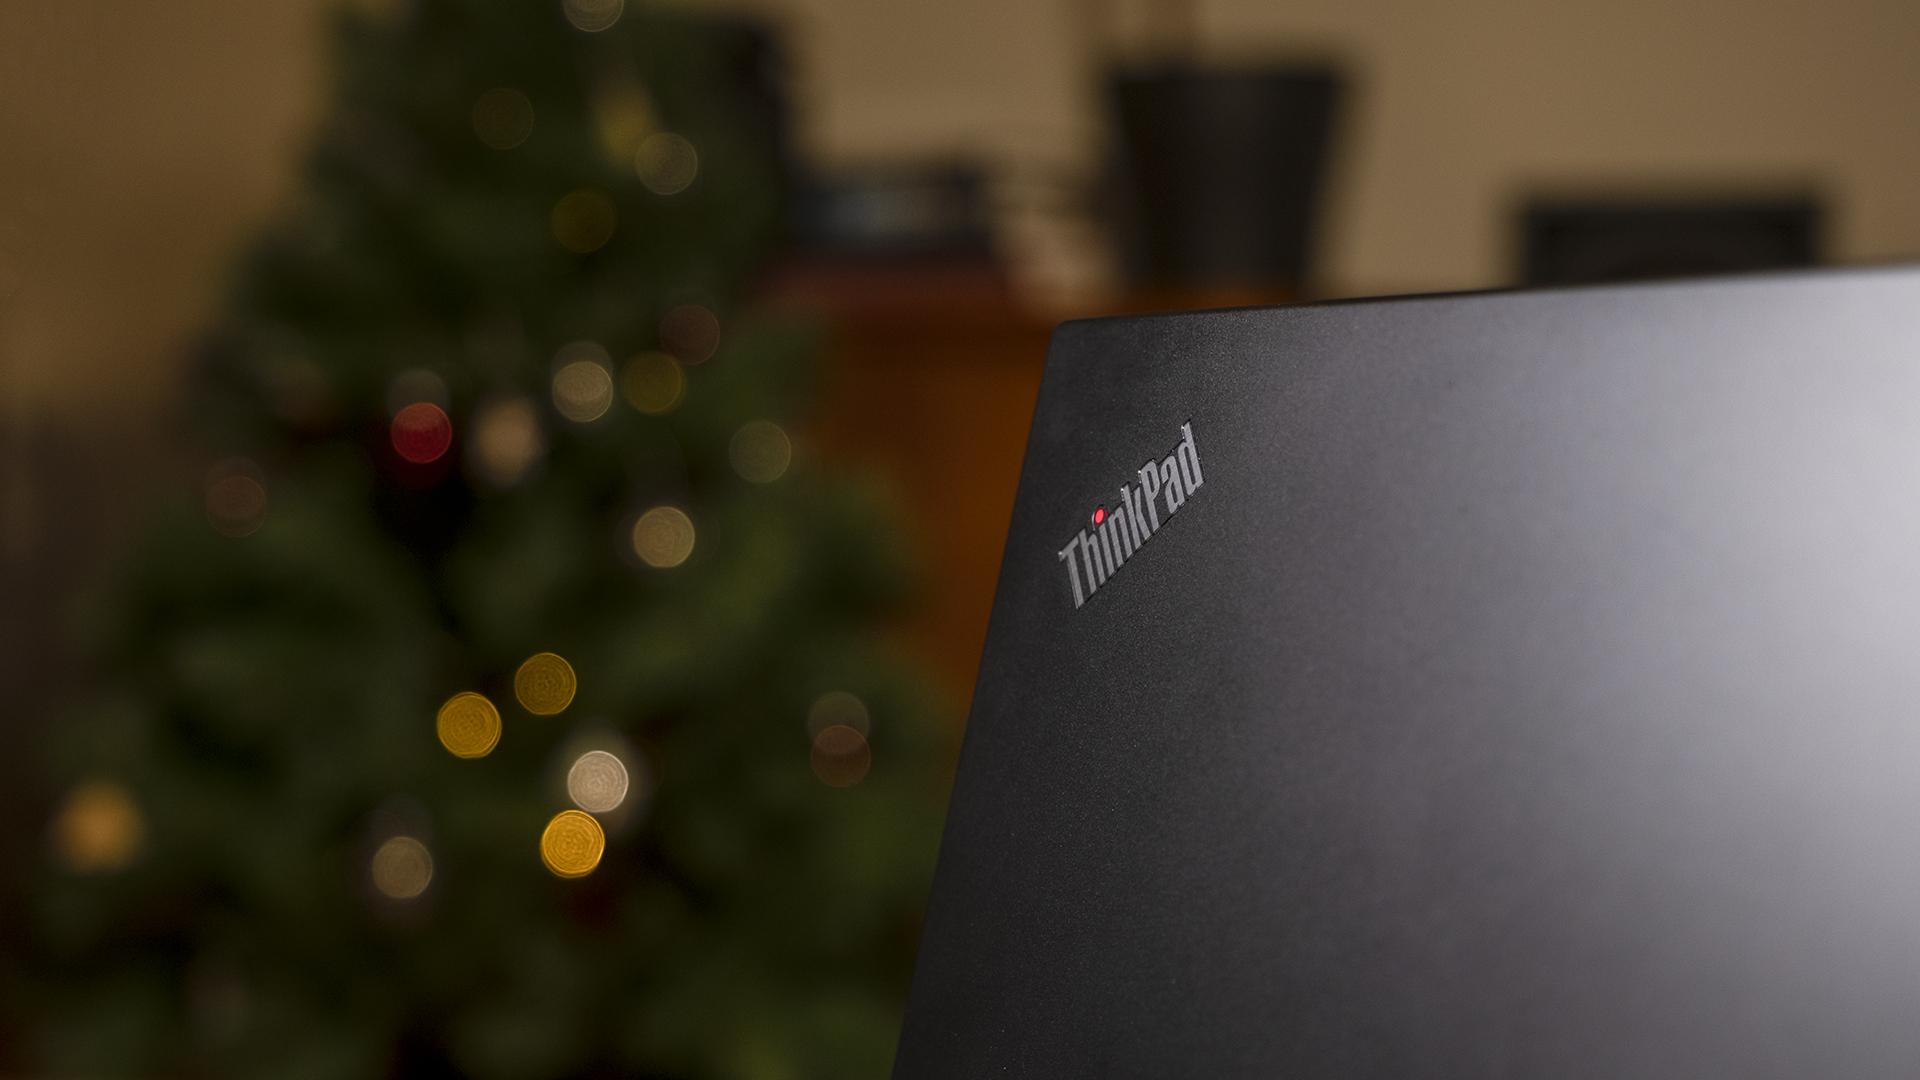 Lenovo ThinkPad L14 AMD Deckel XMAS